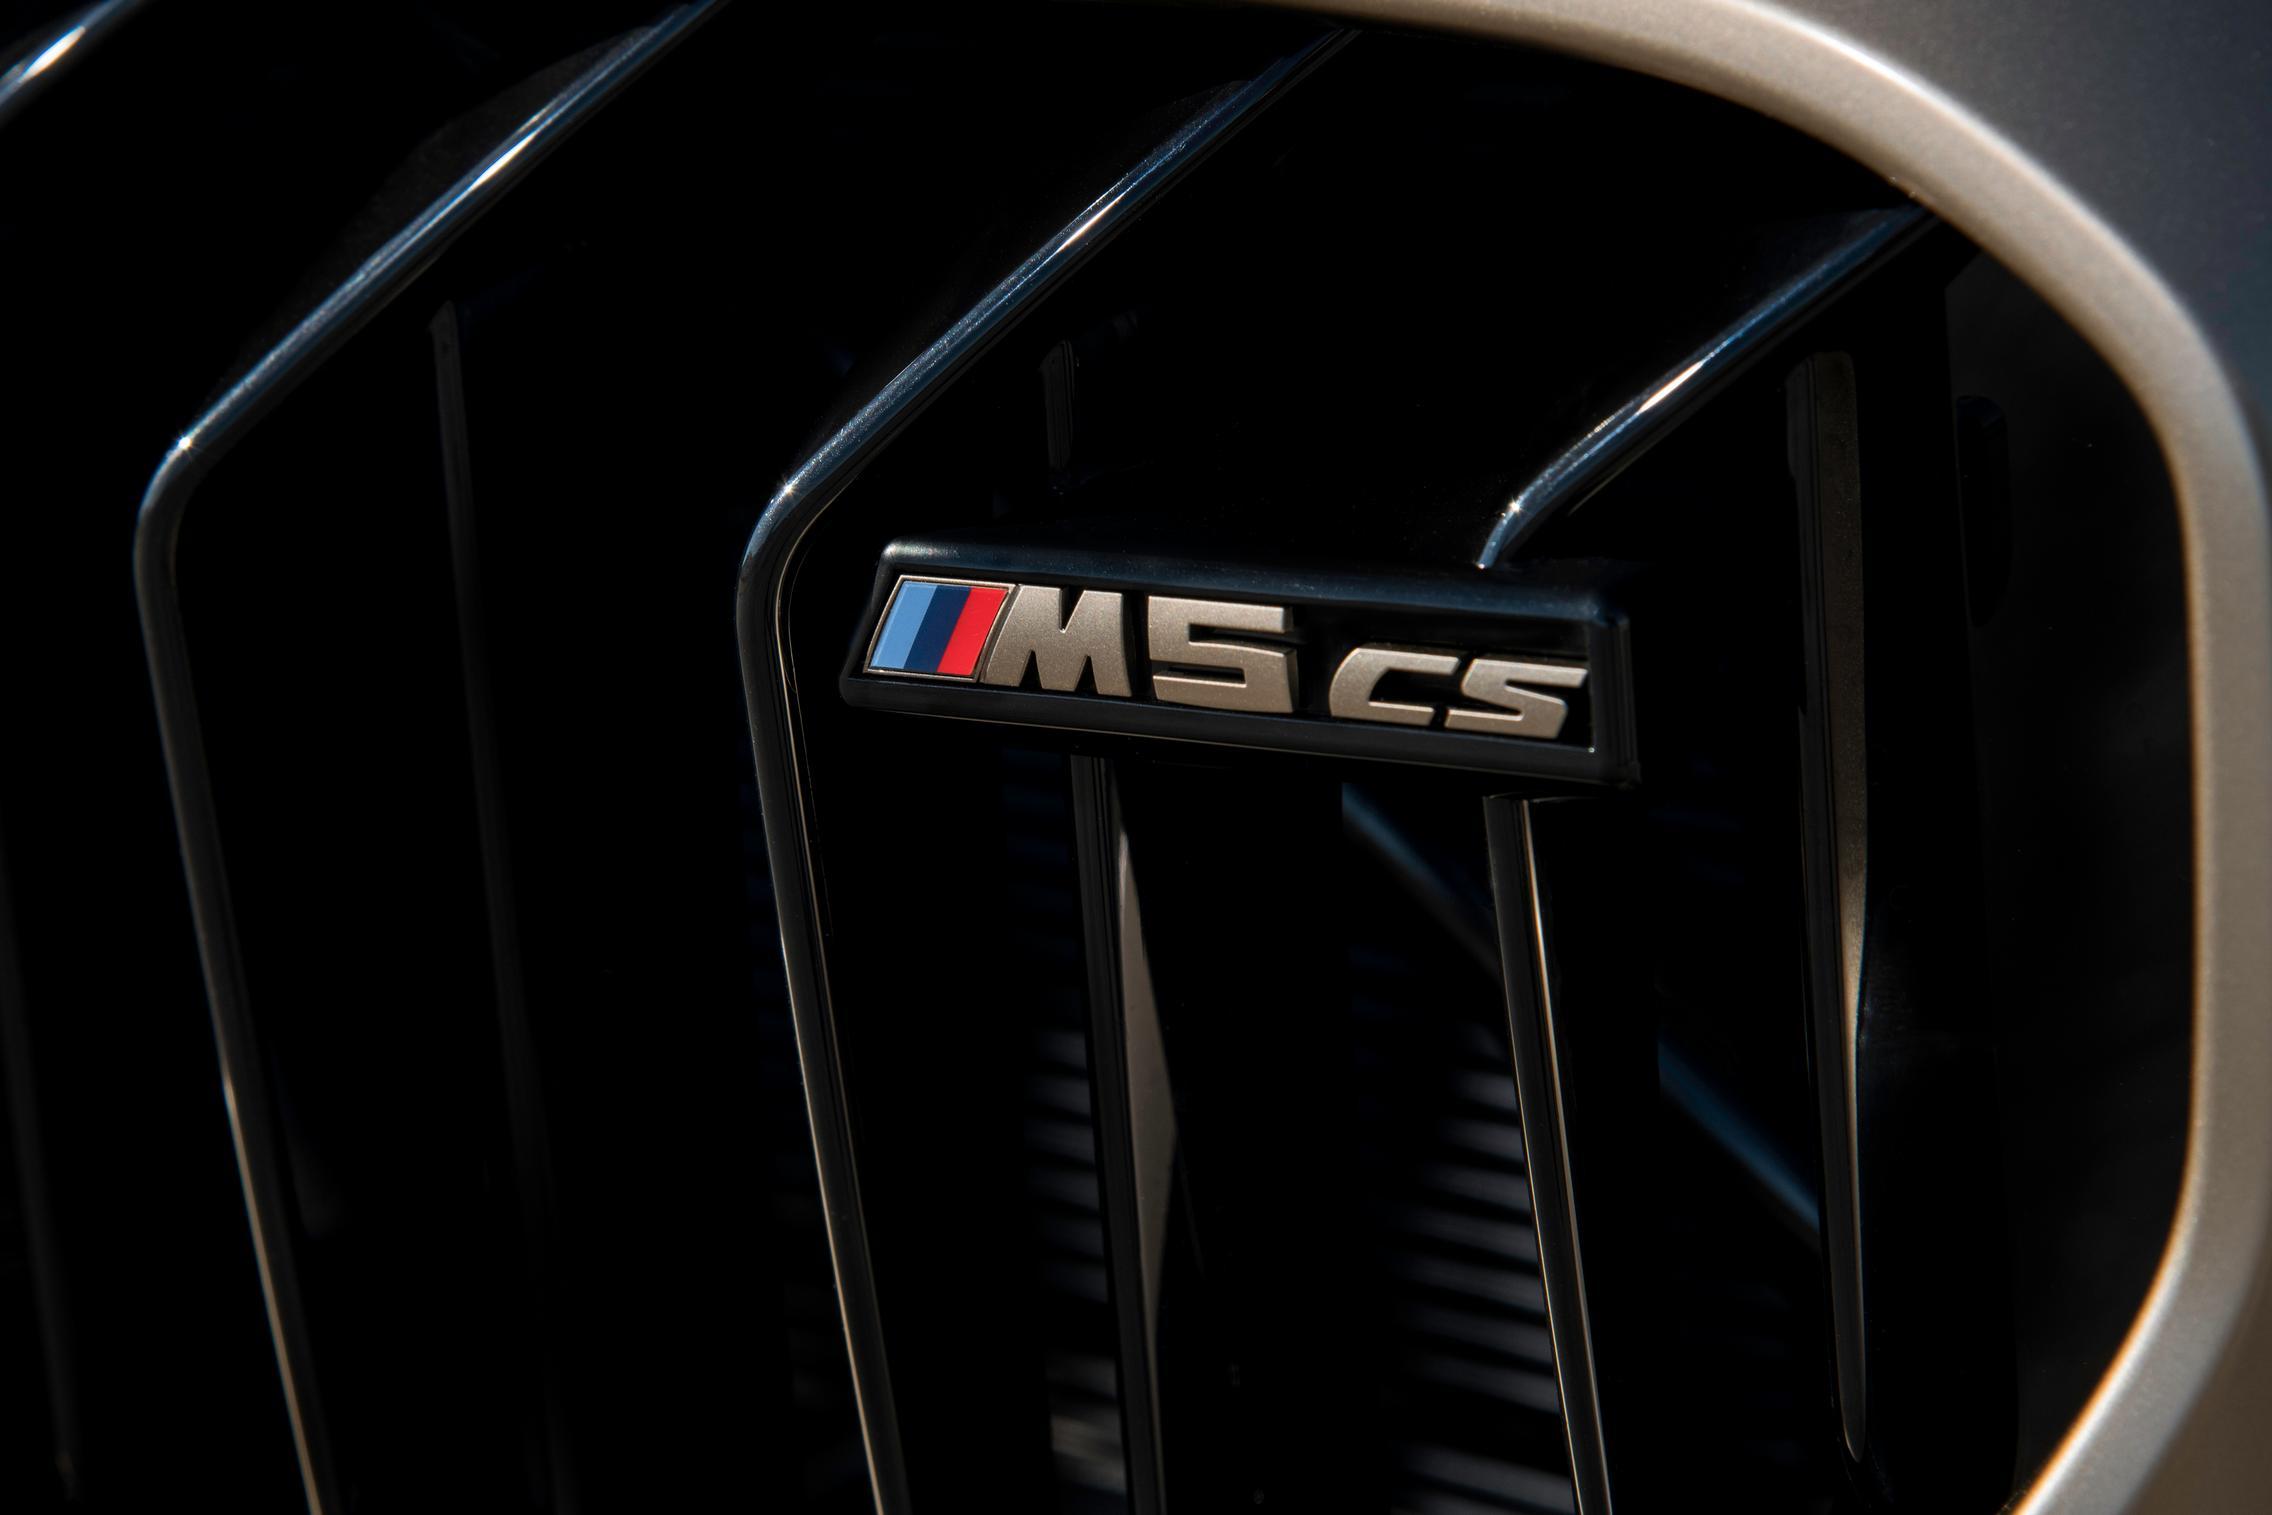 M5 CS badge